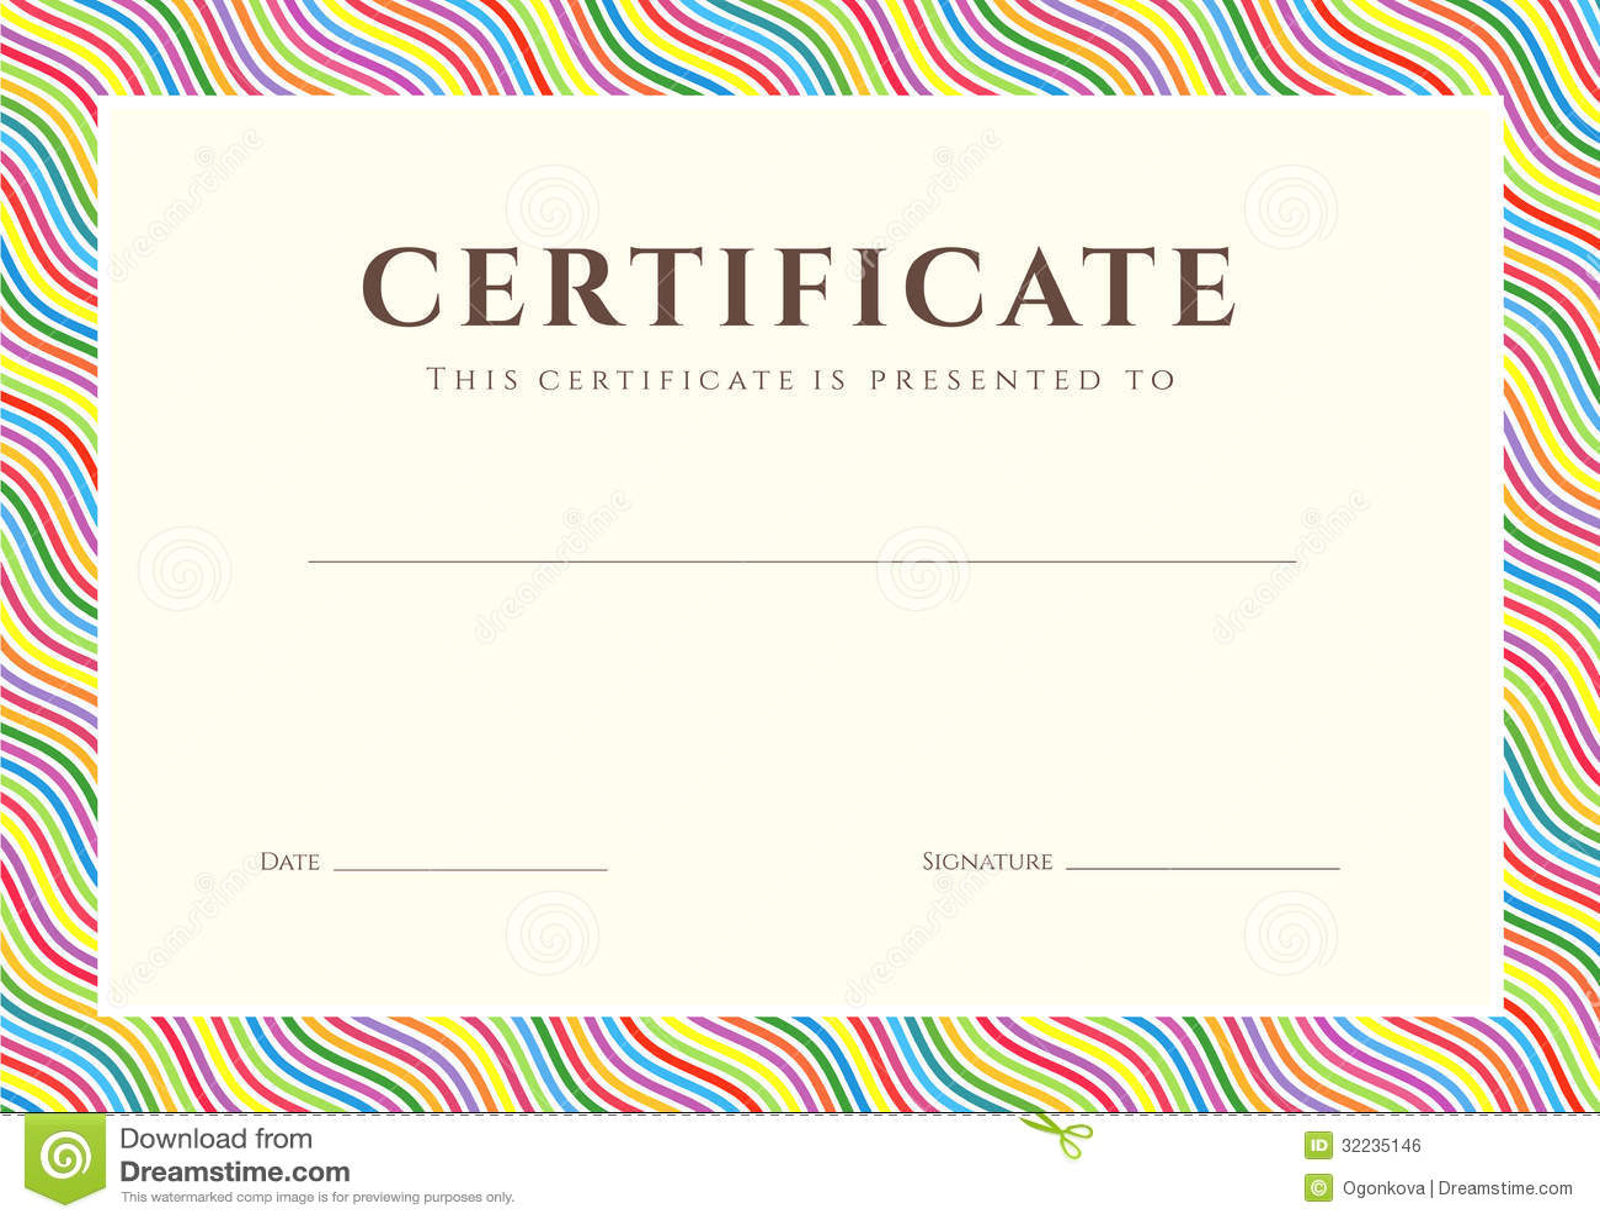 Certificate / Diploma Background (Template) Illustration 32235146 - Megapixl